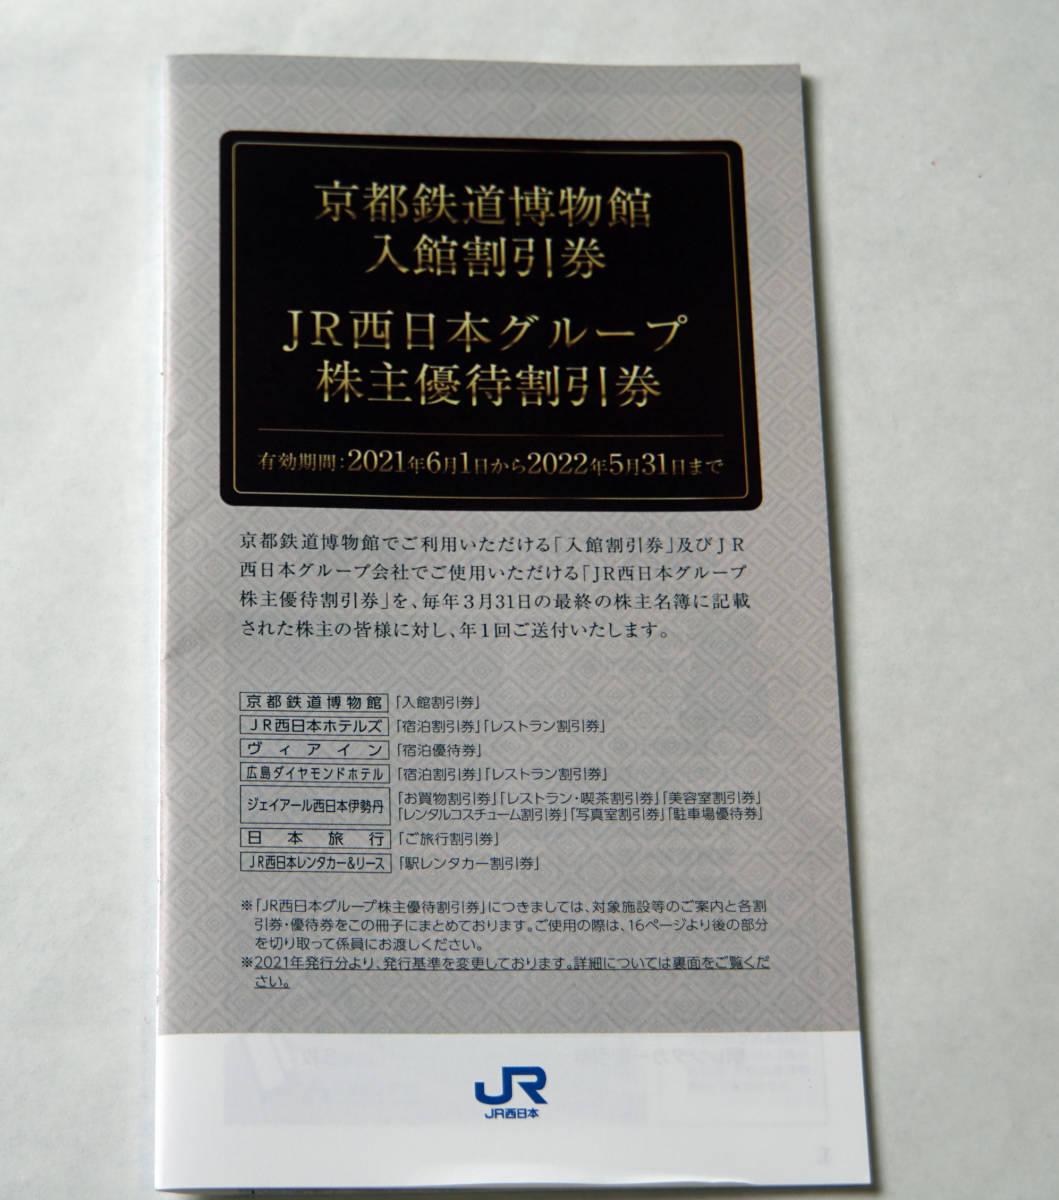 JR西日本 株主優待鉄道割引券 X10枚+三越百貨店、ホテル・レストランなど割引券 有効期限 2022年5月31日まで_画像5